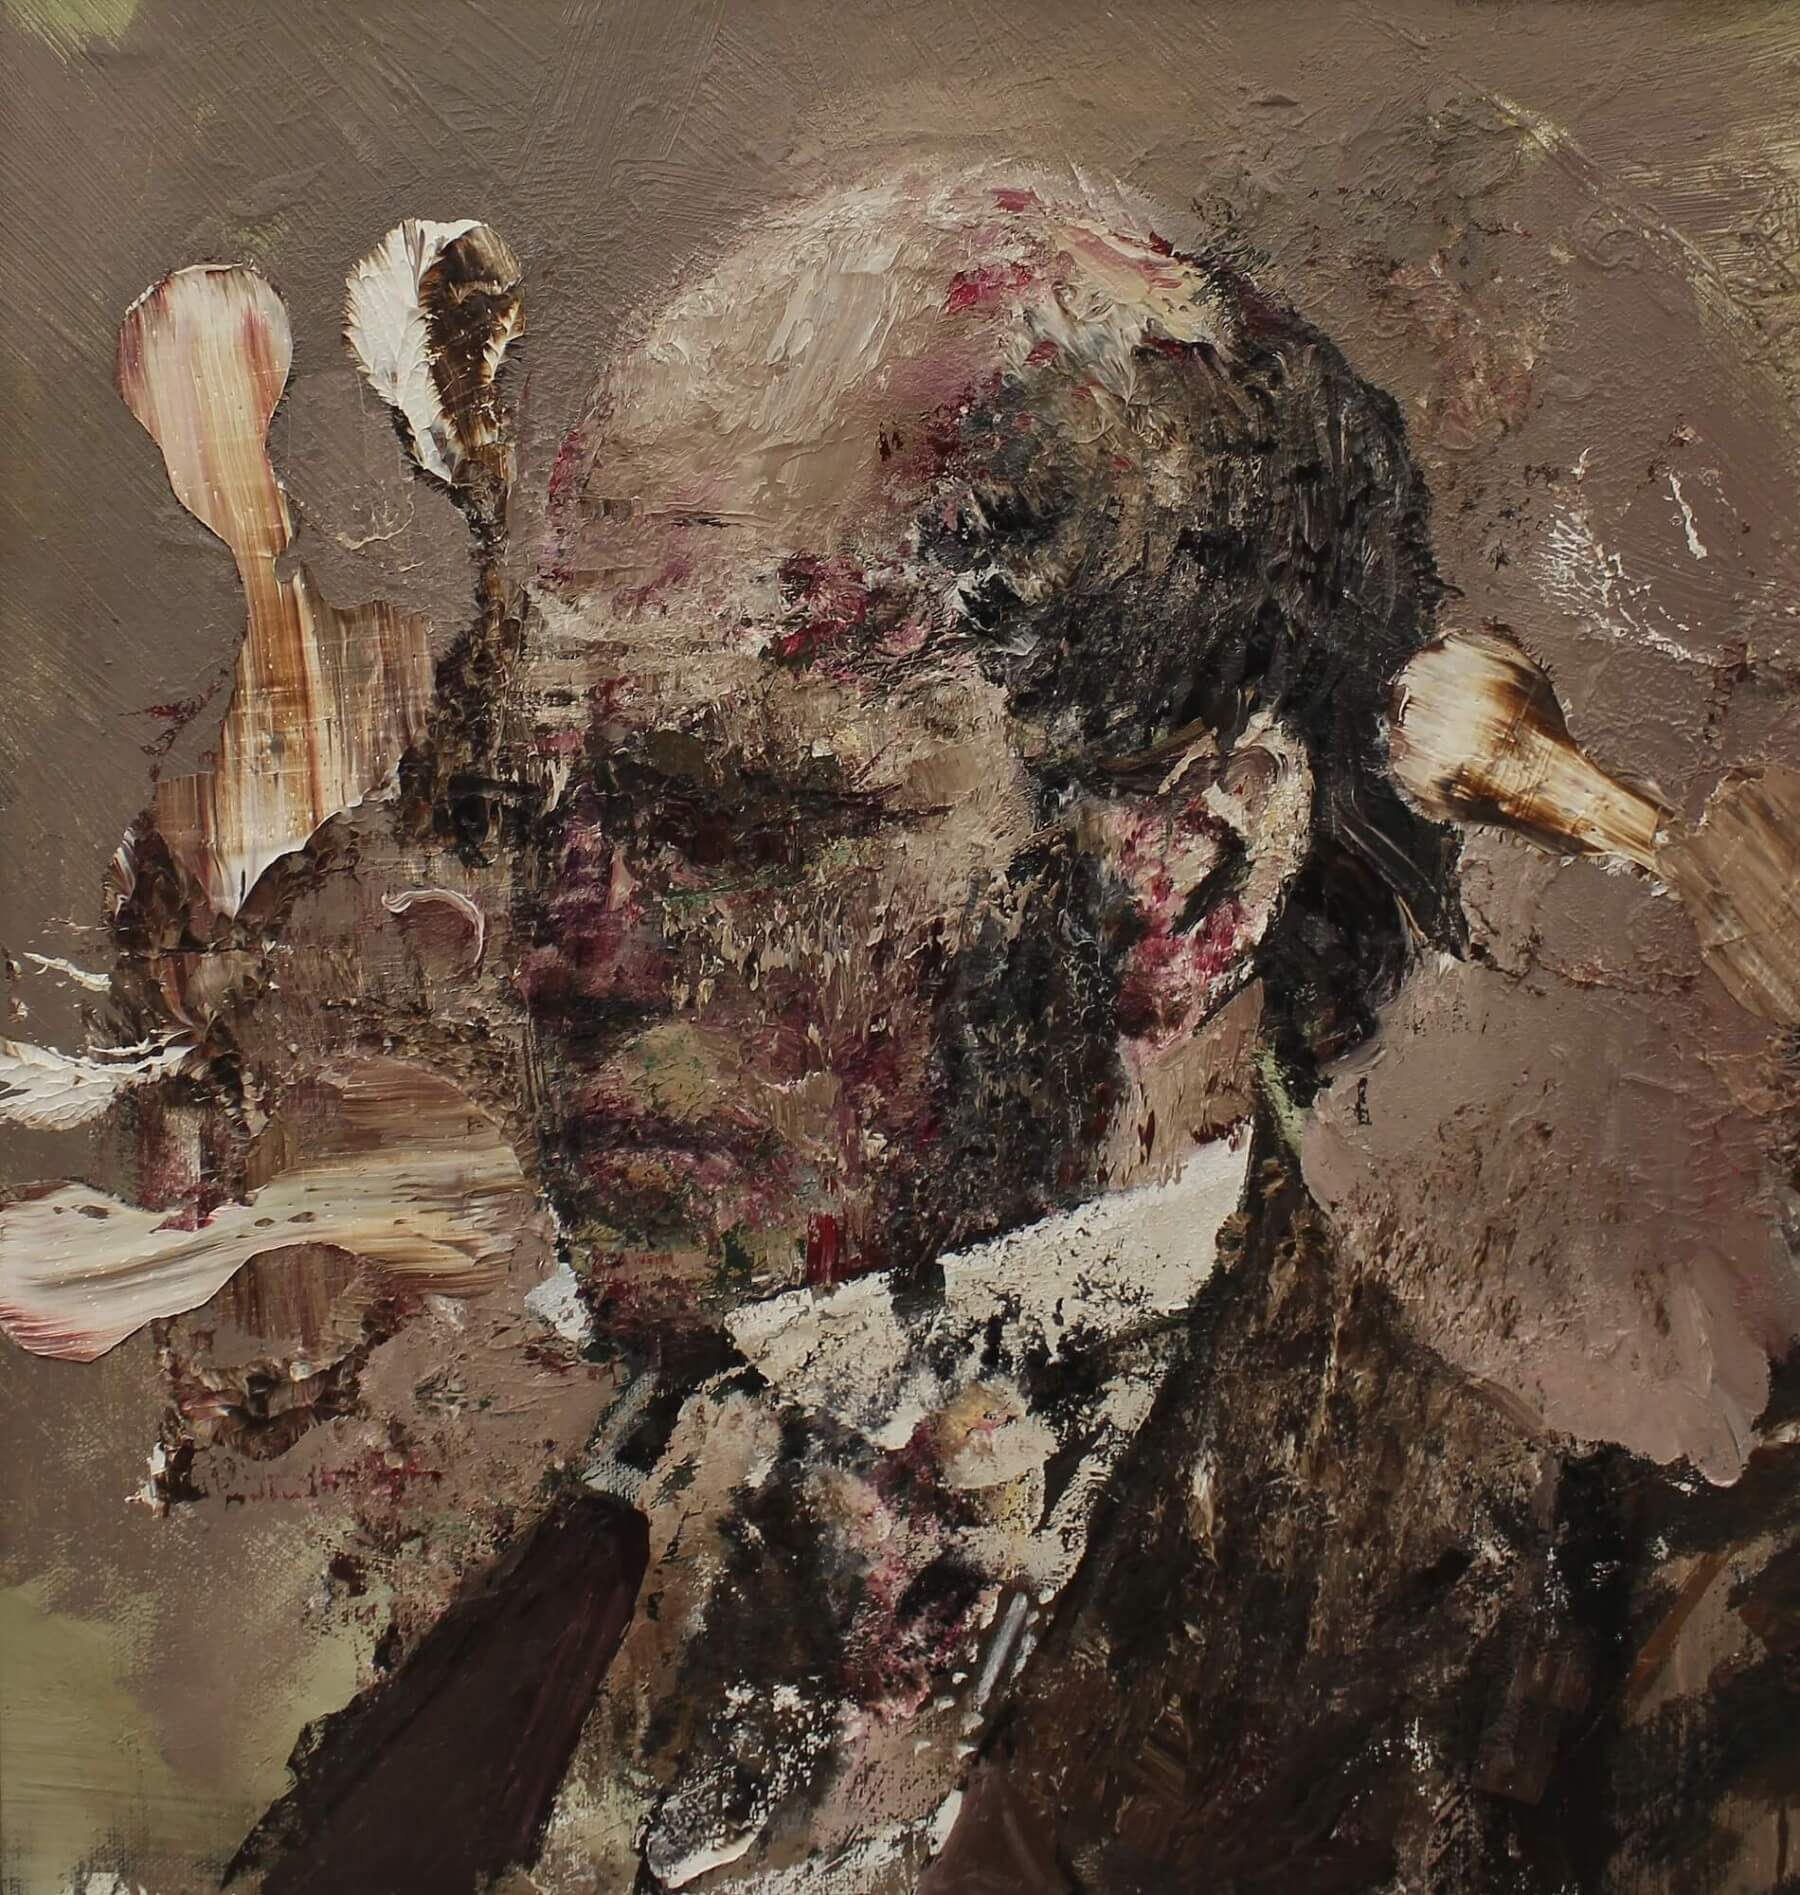 18-Adrian-Ghenie-Charles-Darwin-as-a-Young-Man-2013-1800x1895